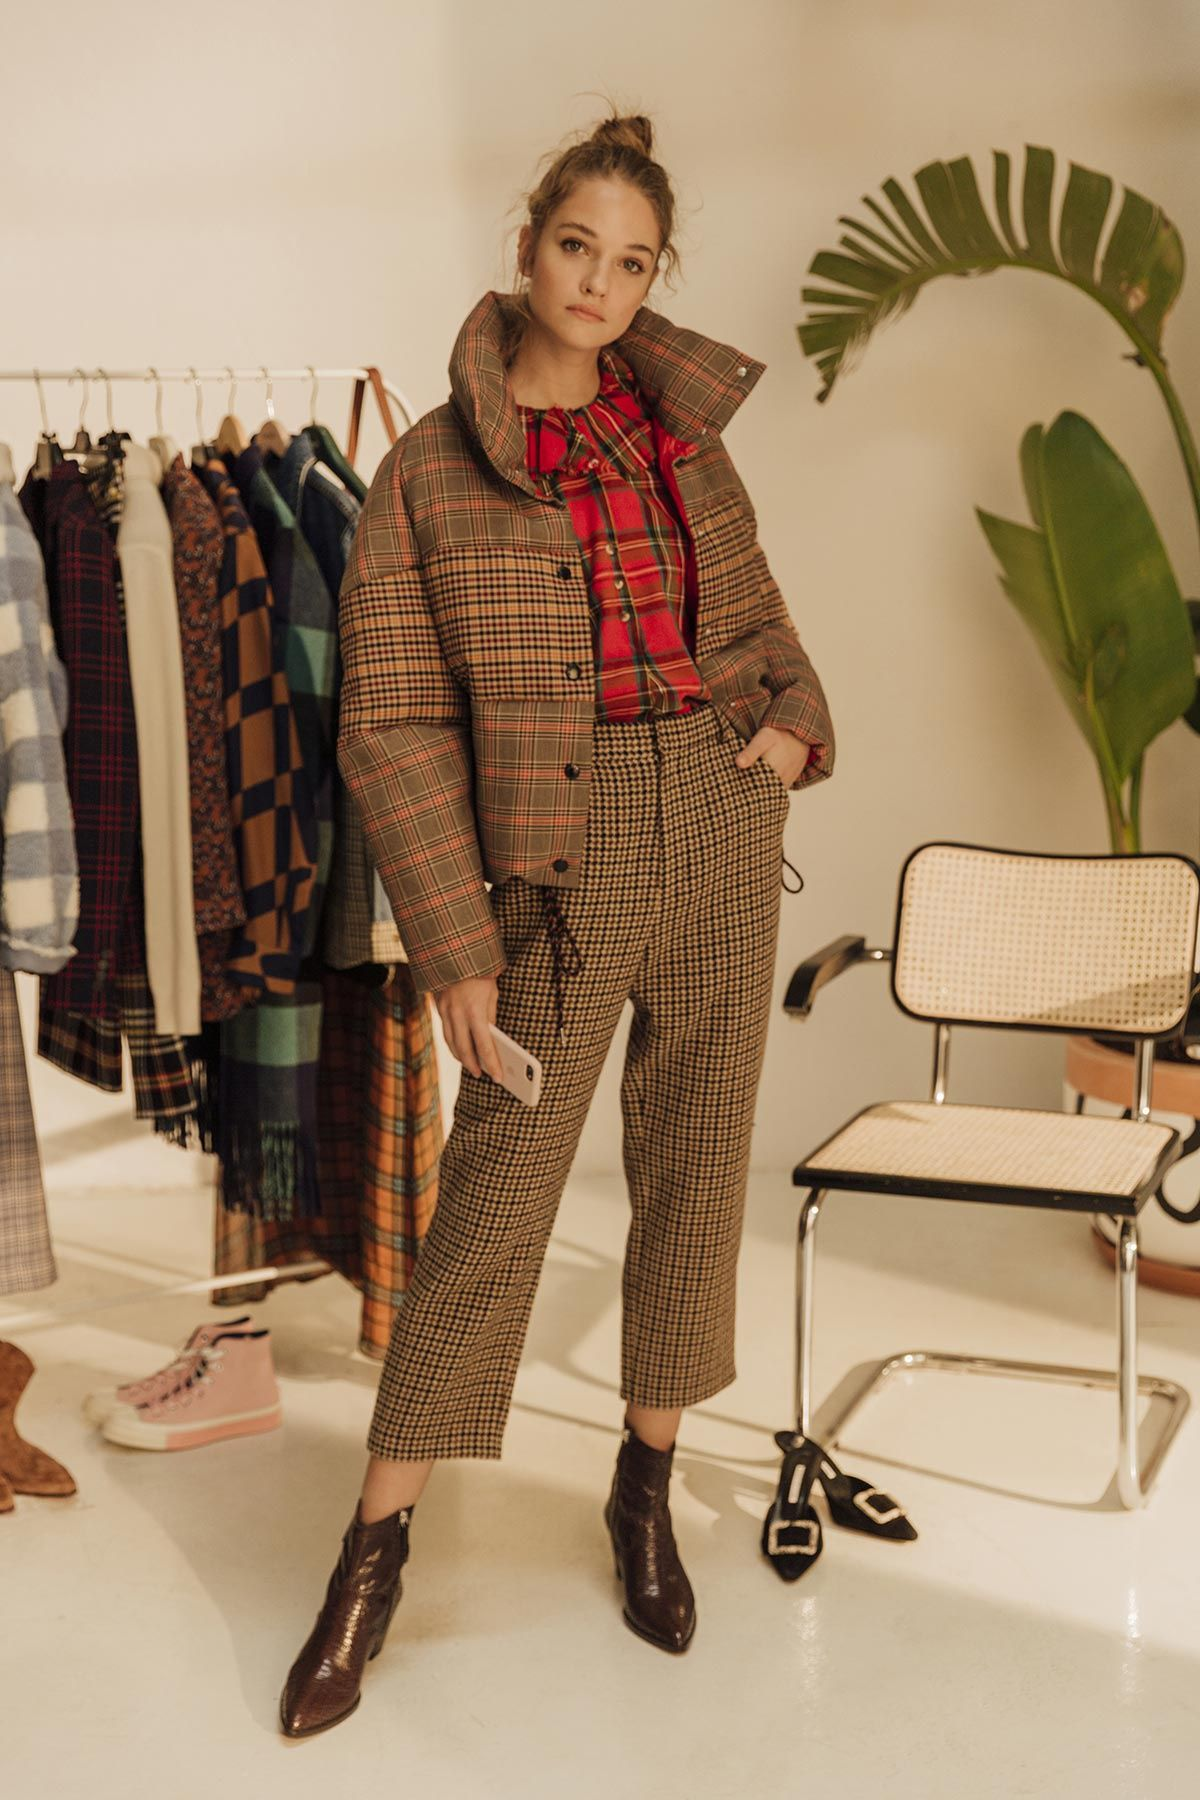 Abrigo Xqtnp6bxs Fashion Plumas Un Look Pijo Moda 2019 En Con Y 76wqw5xB